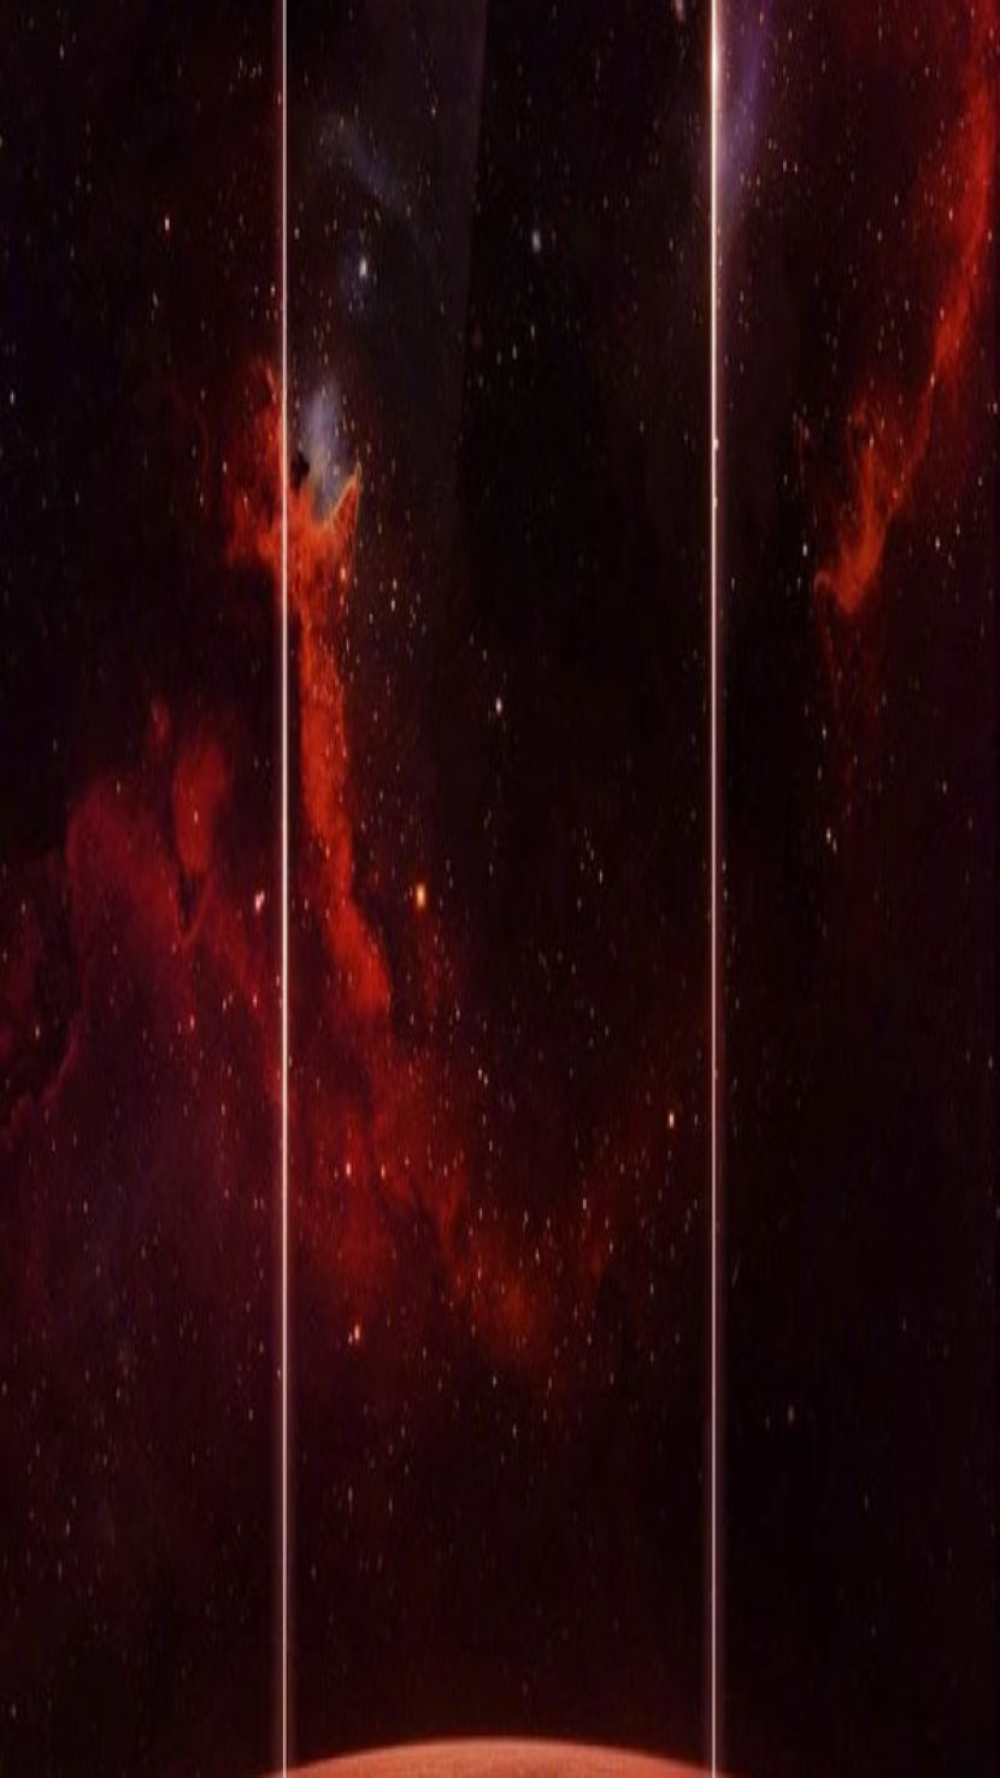 Huawei: Θα παρουσιάσει smartphone με οπή στην πρόσοψη μέσα στο Δεκέμβριο;